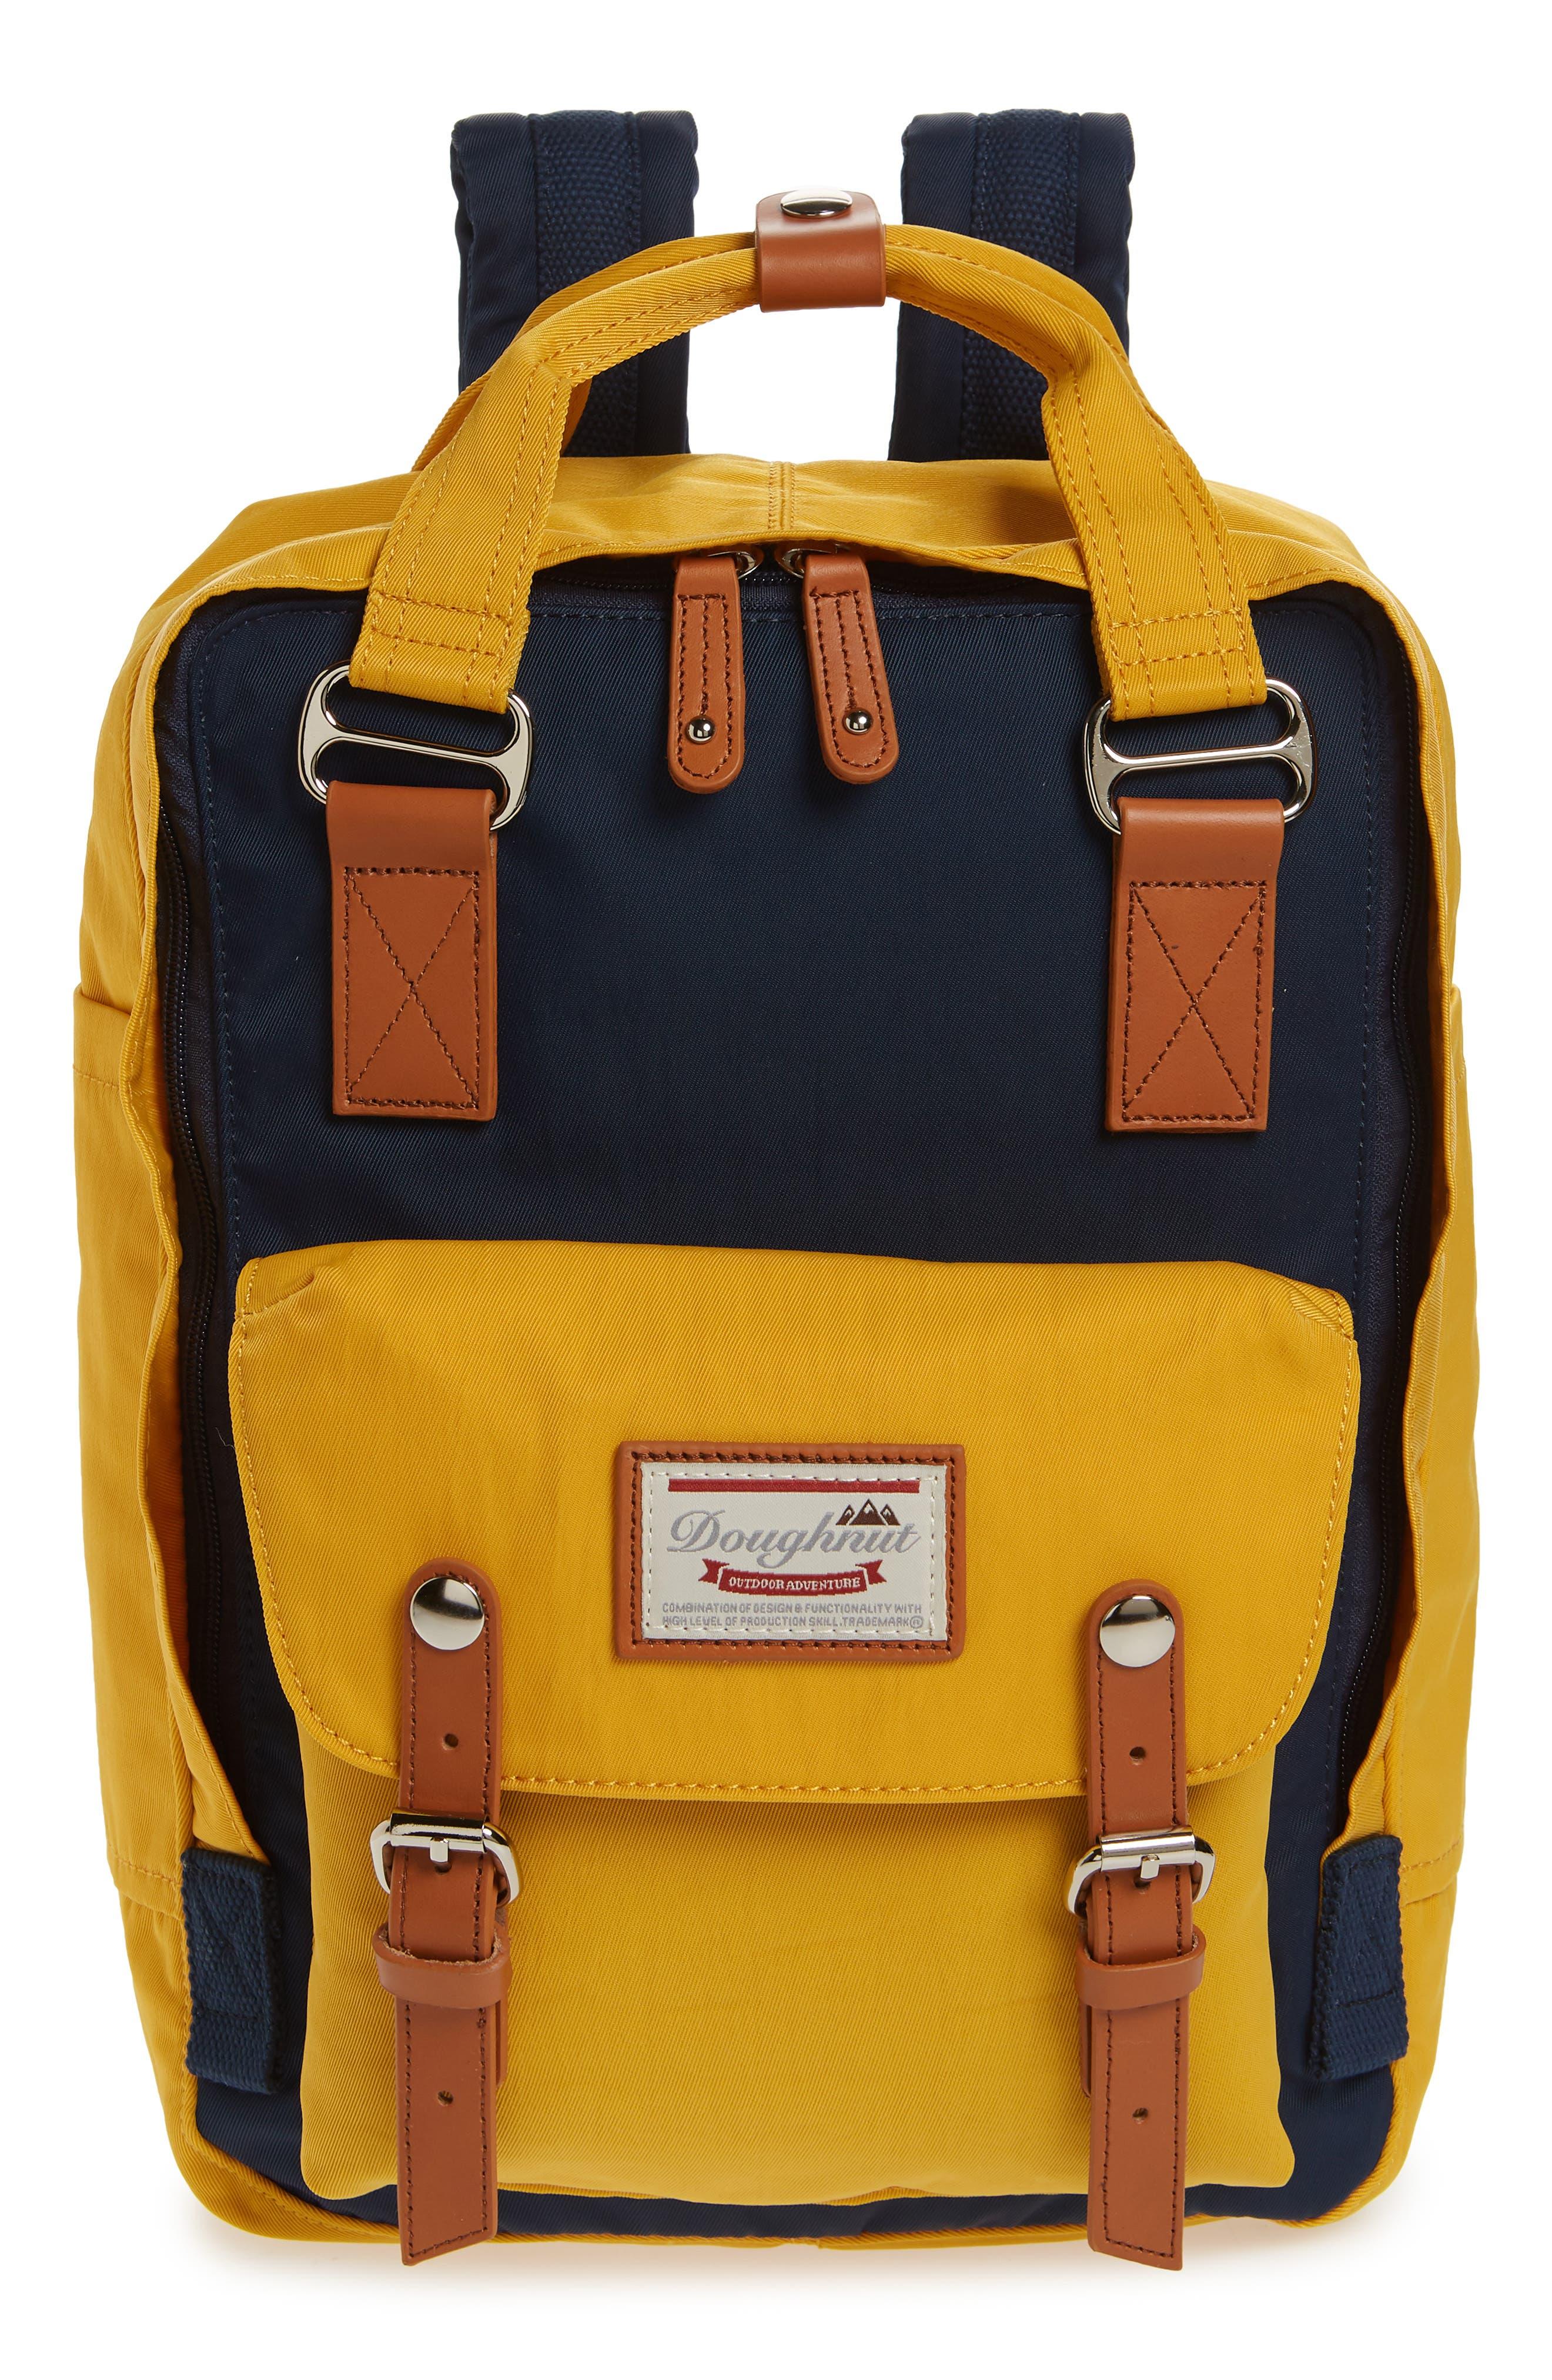 ea59a3ca30 Women s DOUGHNUT Backpacks